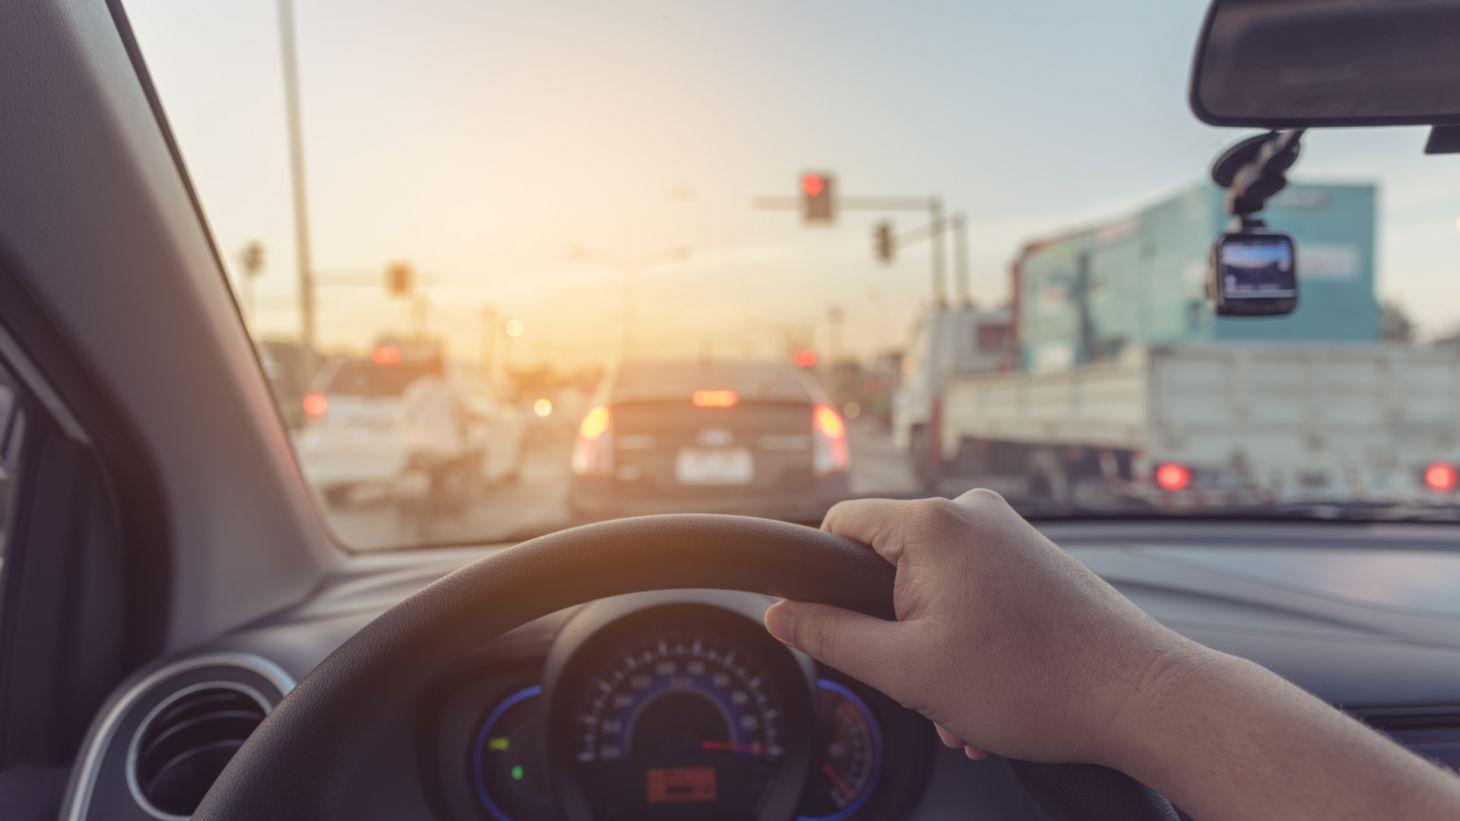 motorista mao volante painel para brisas transito frente carros